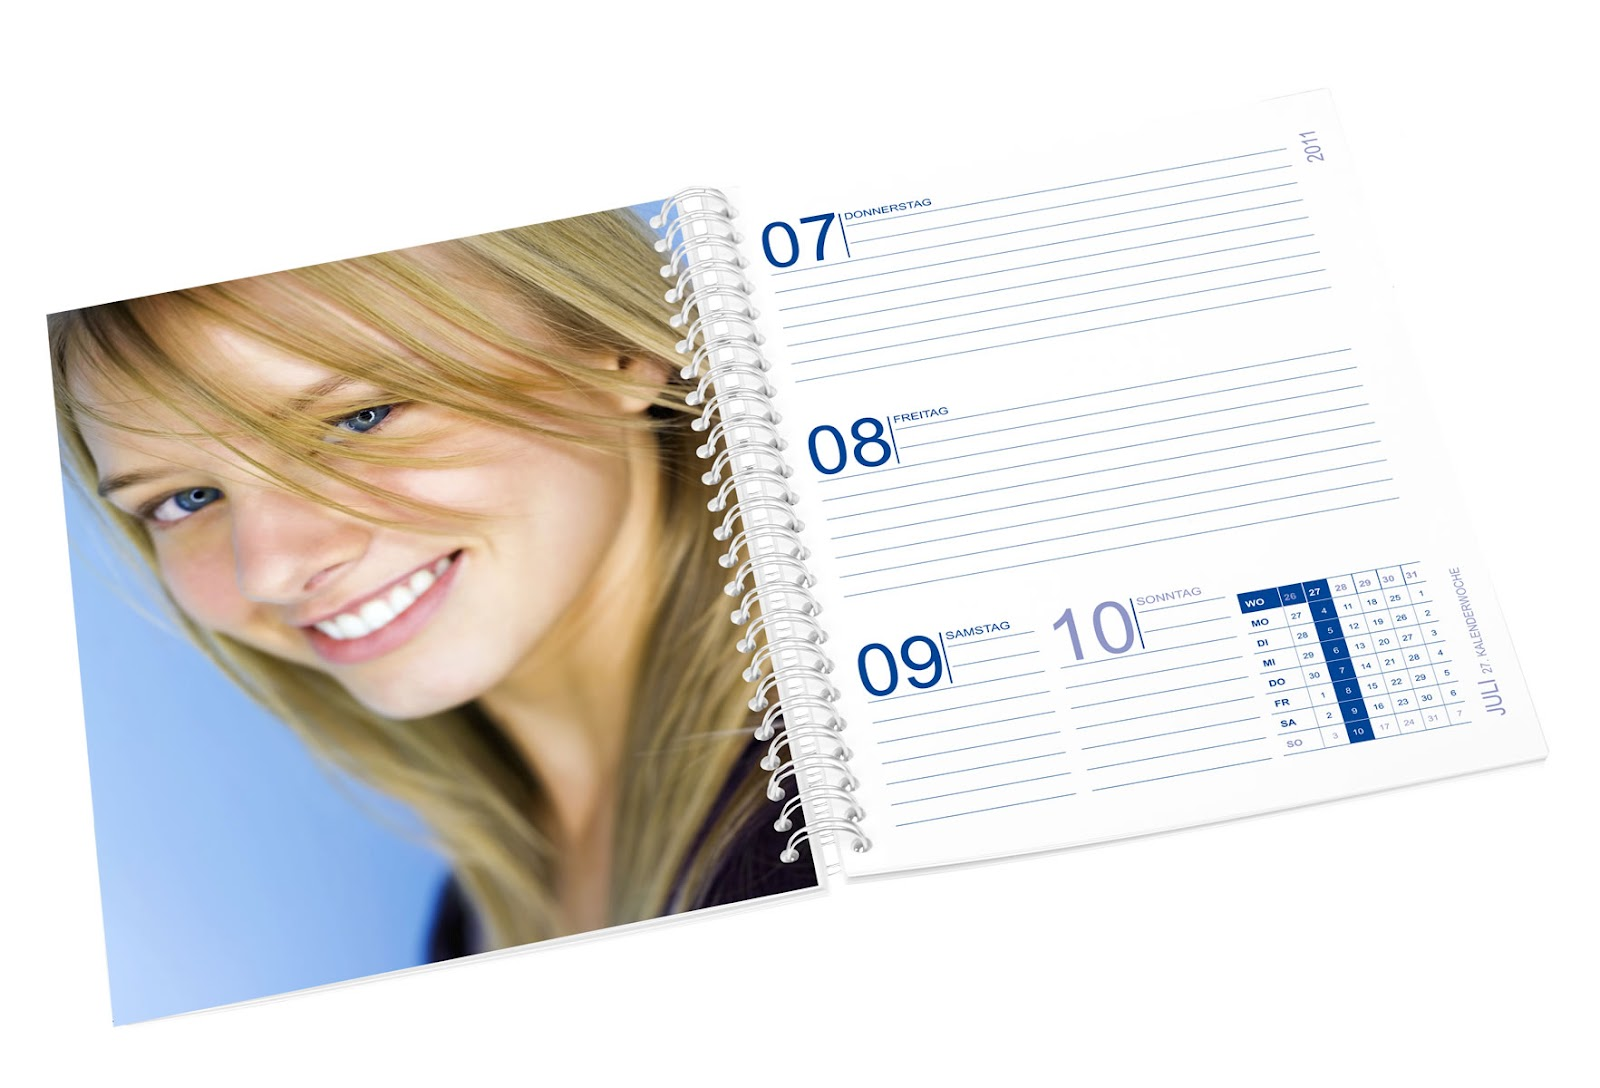 dk content index open id printprodukter.